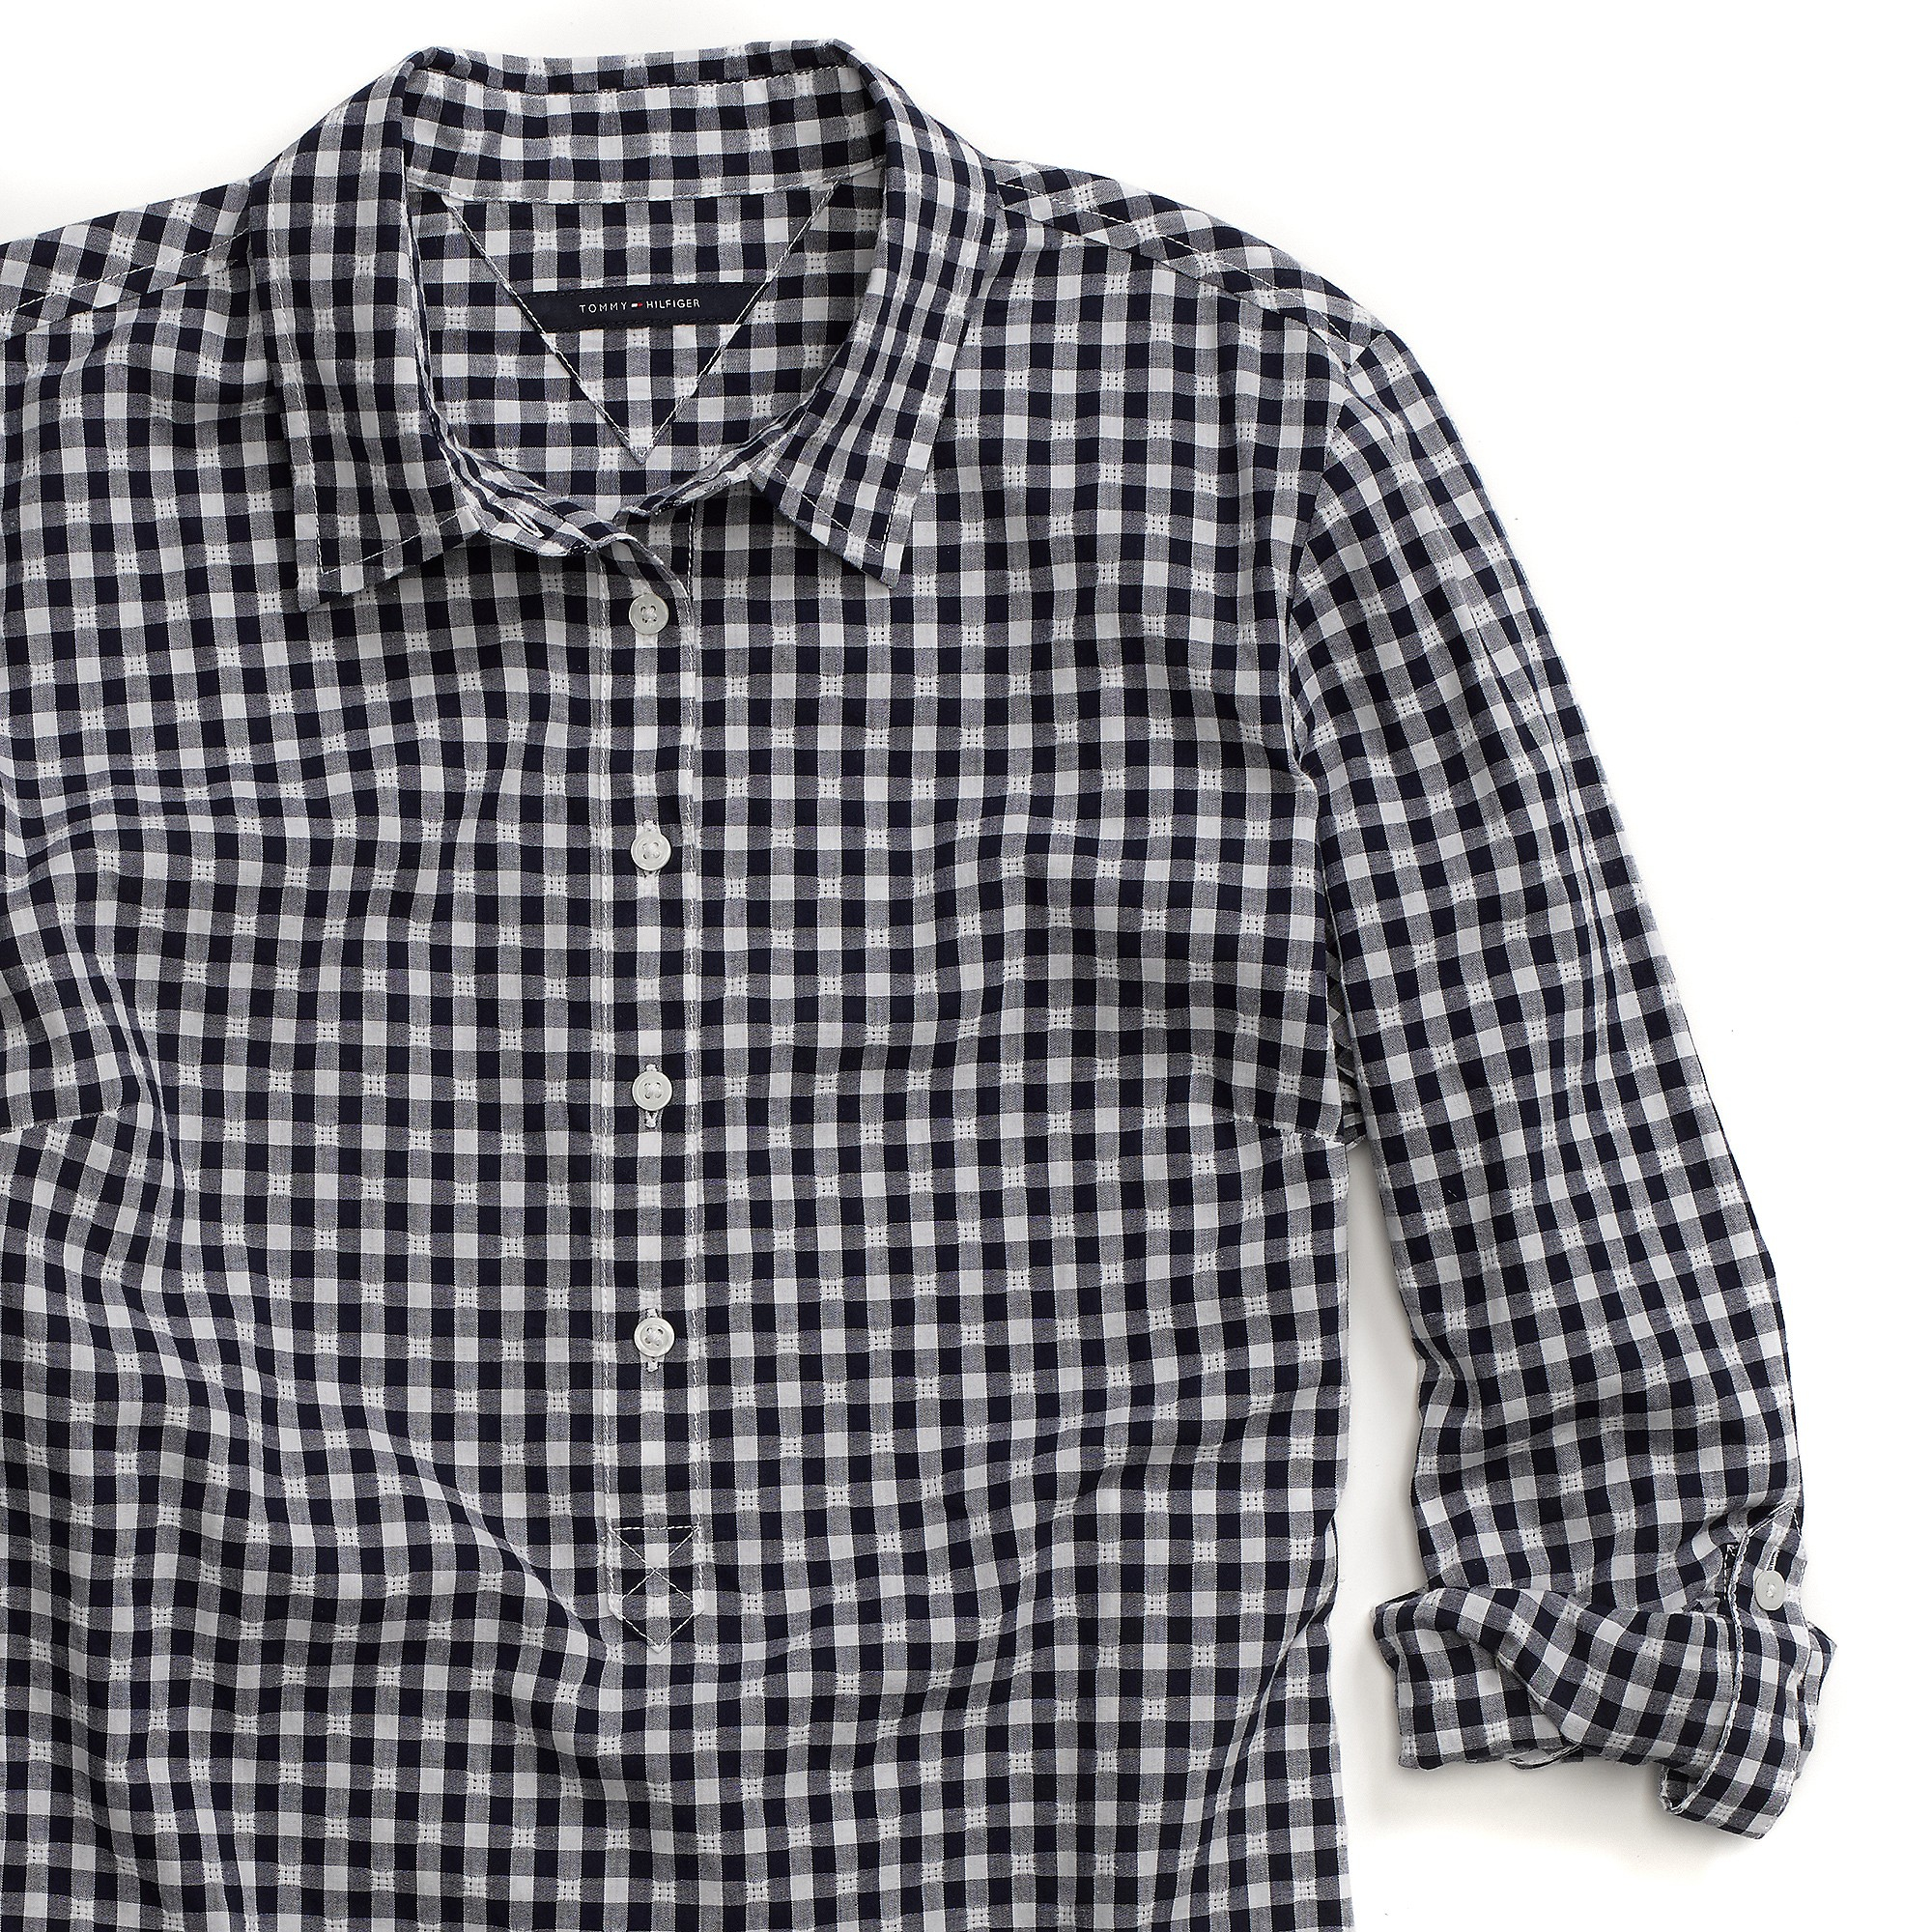 Tommy Hilfiger Gingham Popover Shirt In Black Peacoat